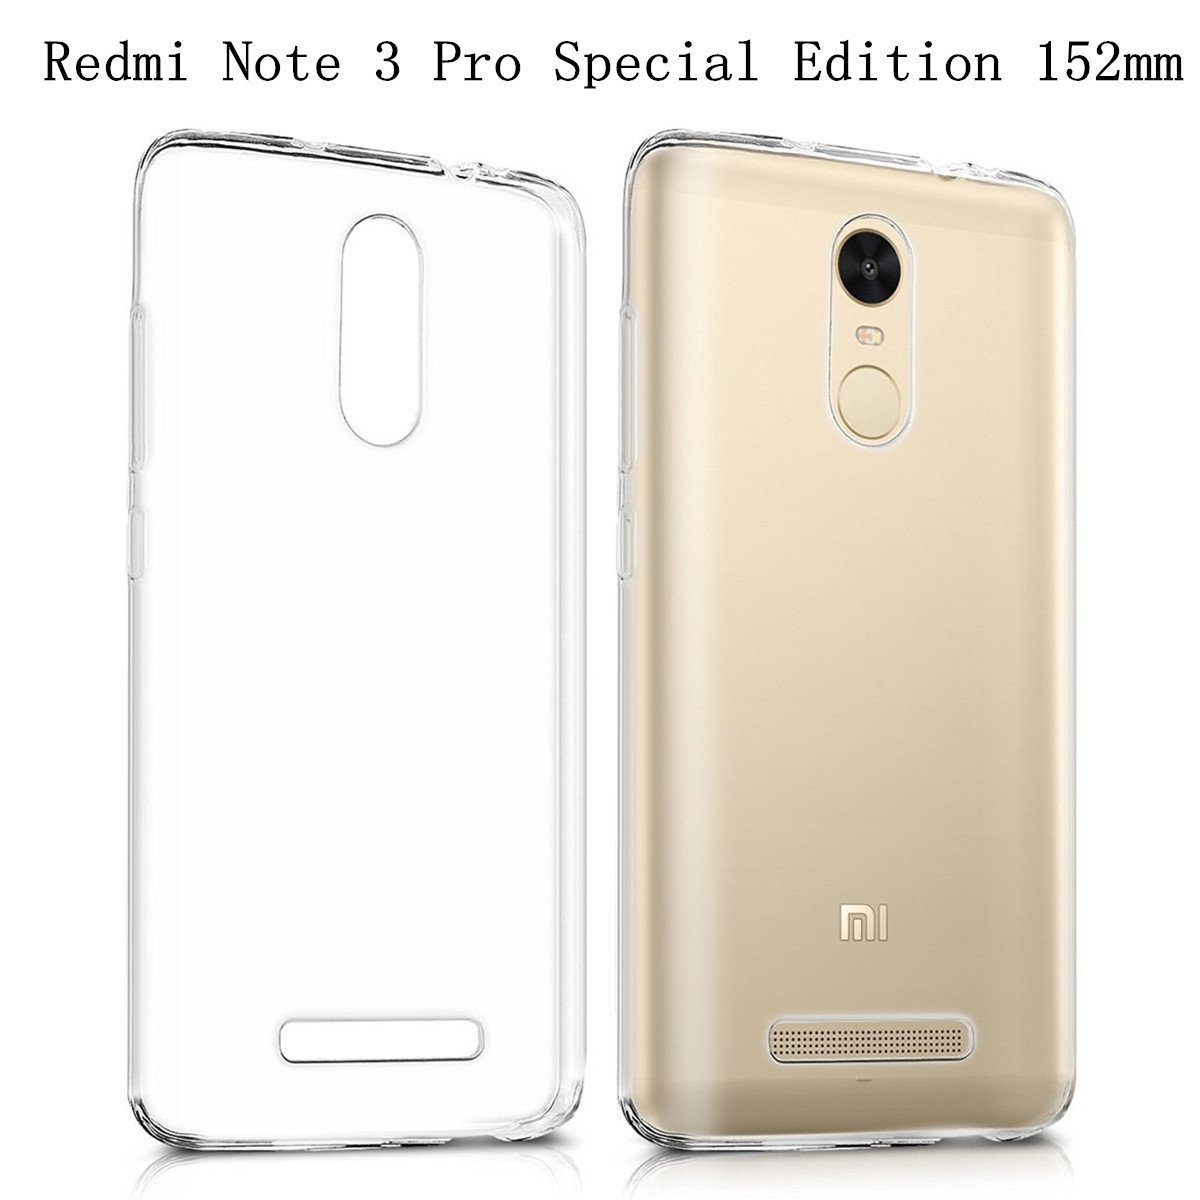 Info Harga Xiaomi Redmi Note 3 Pro 32gb Gold Termurah 2018 Special Edition Case Heyqie Electronics